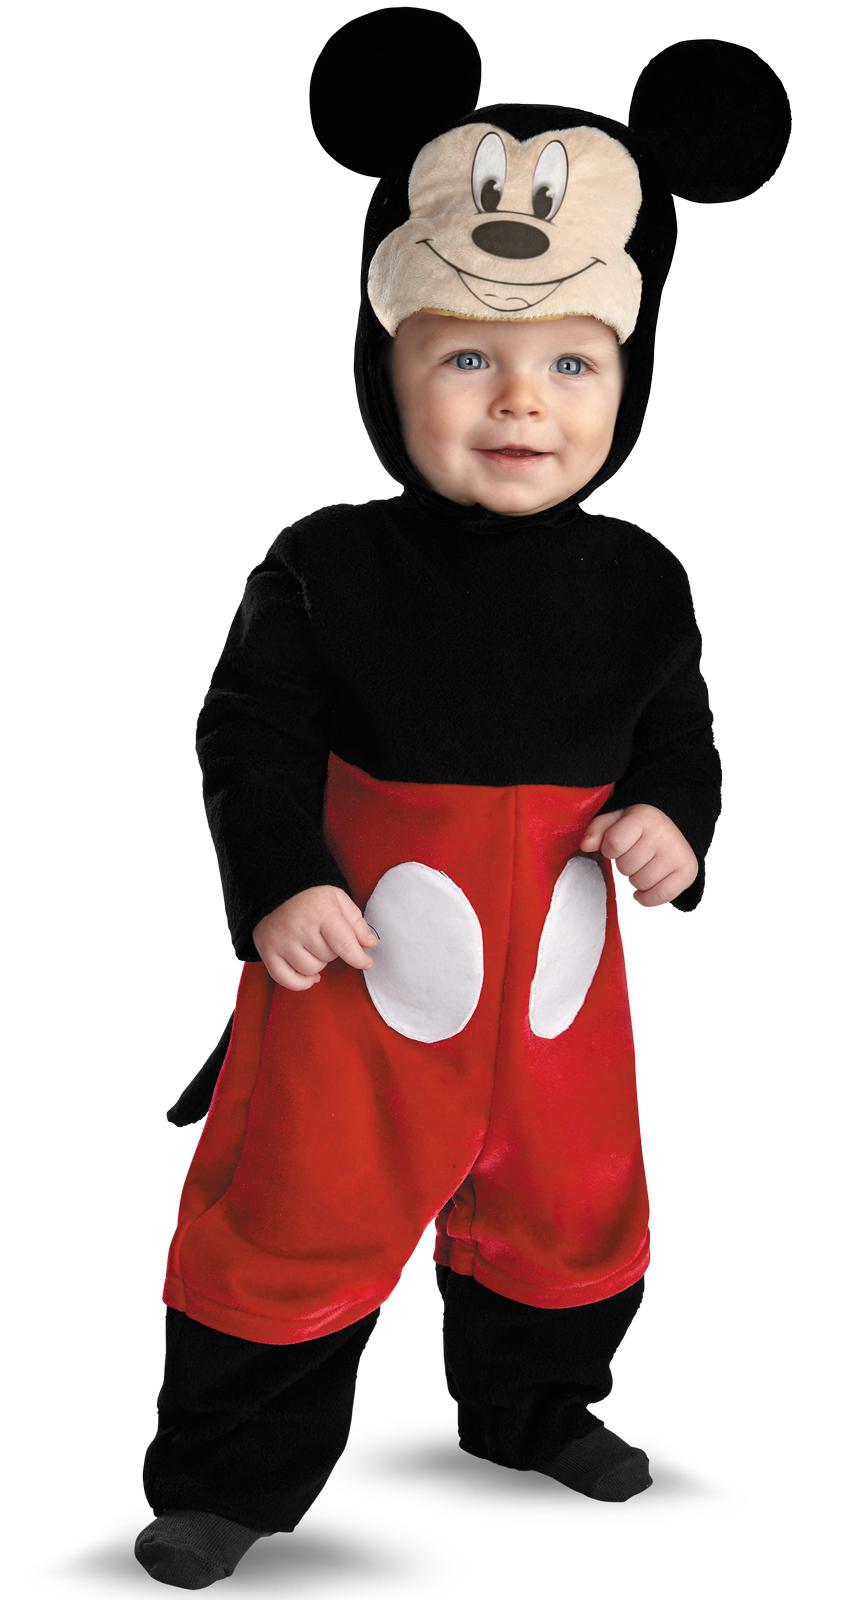 disney mickey mouse infant costume buycostumescom - Baby Mickey Mouse Halloween Costume